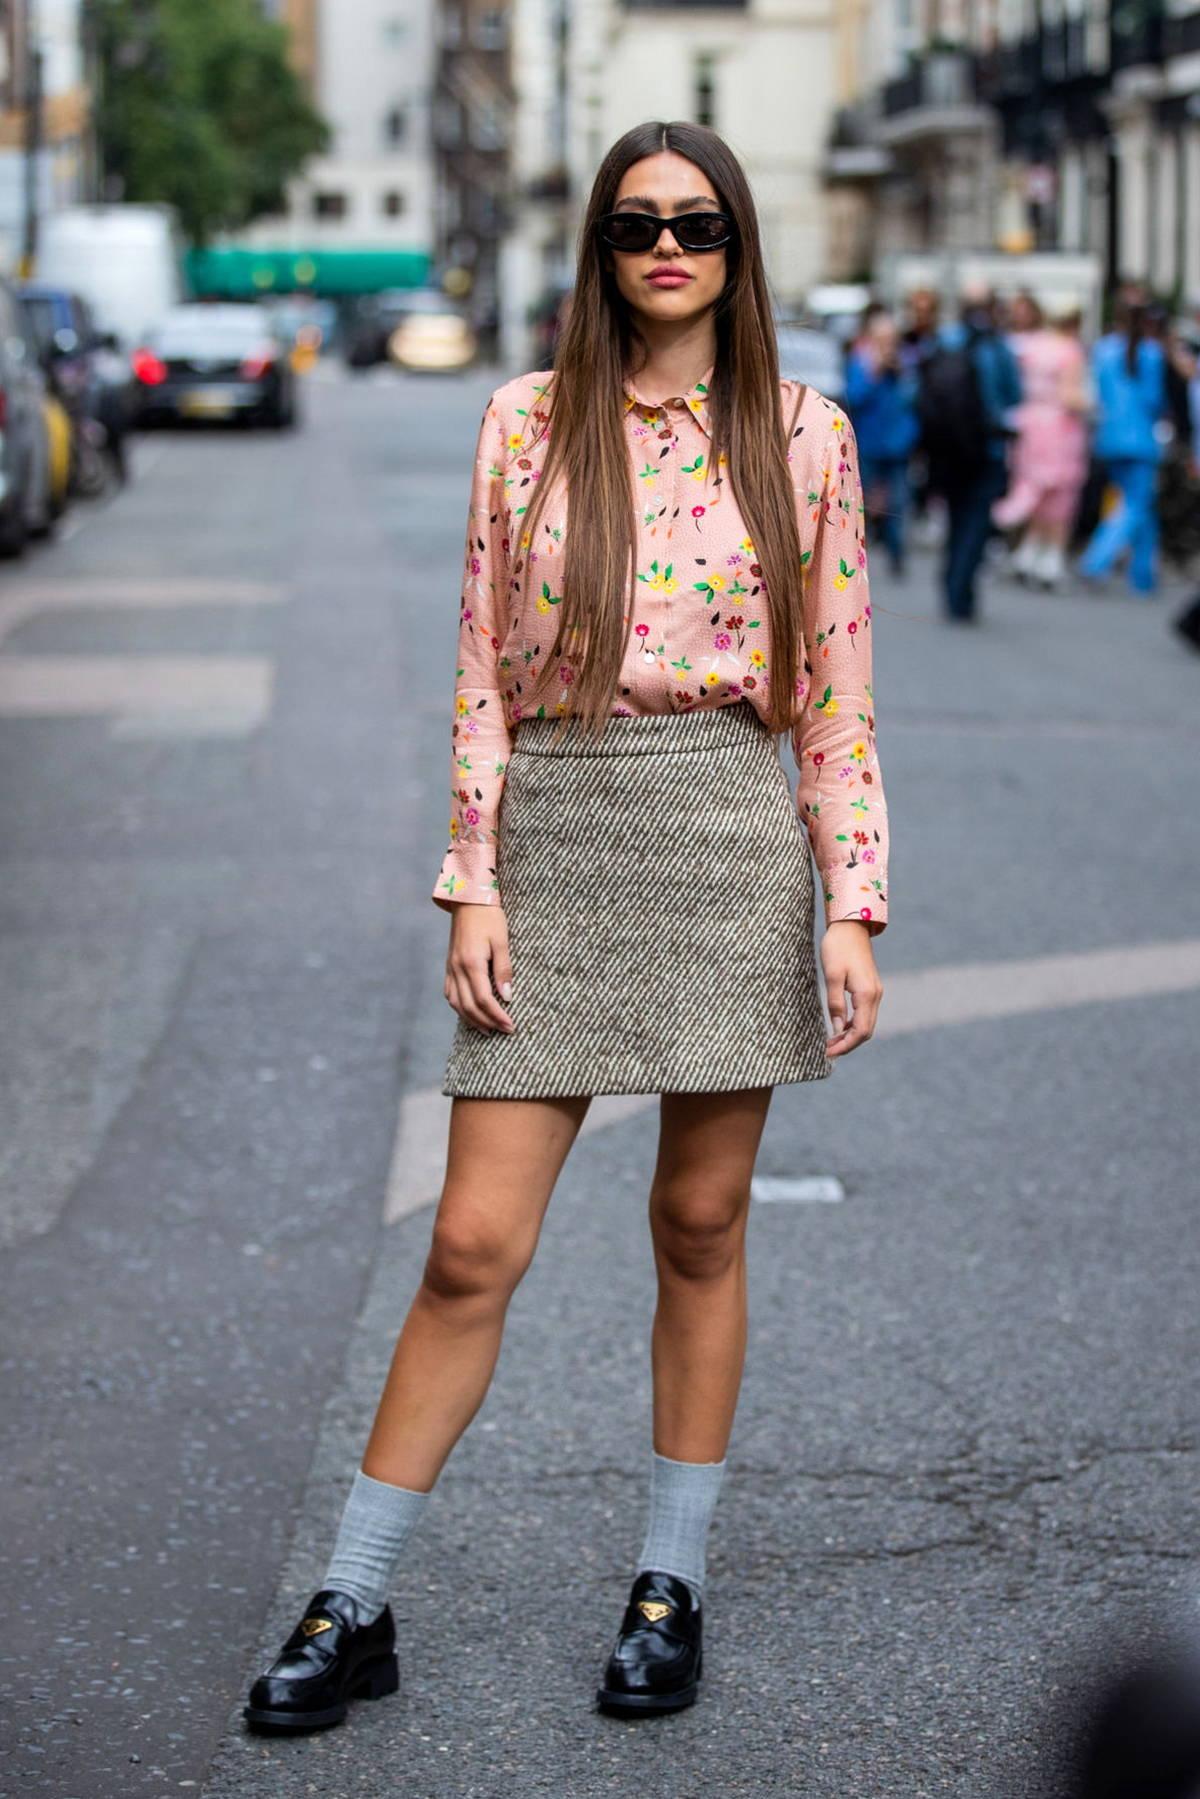 Amelia Hamlin attends the Paul & Joe SS22 show during London Fashion Week at Dartmouth House in London, UK